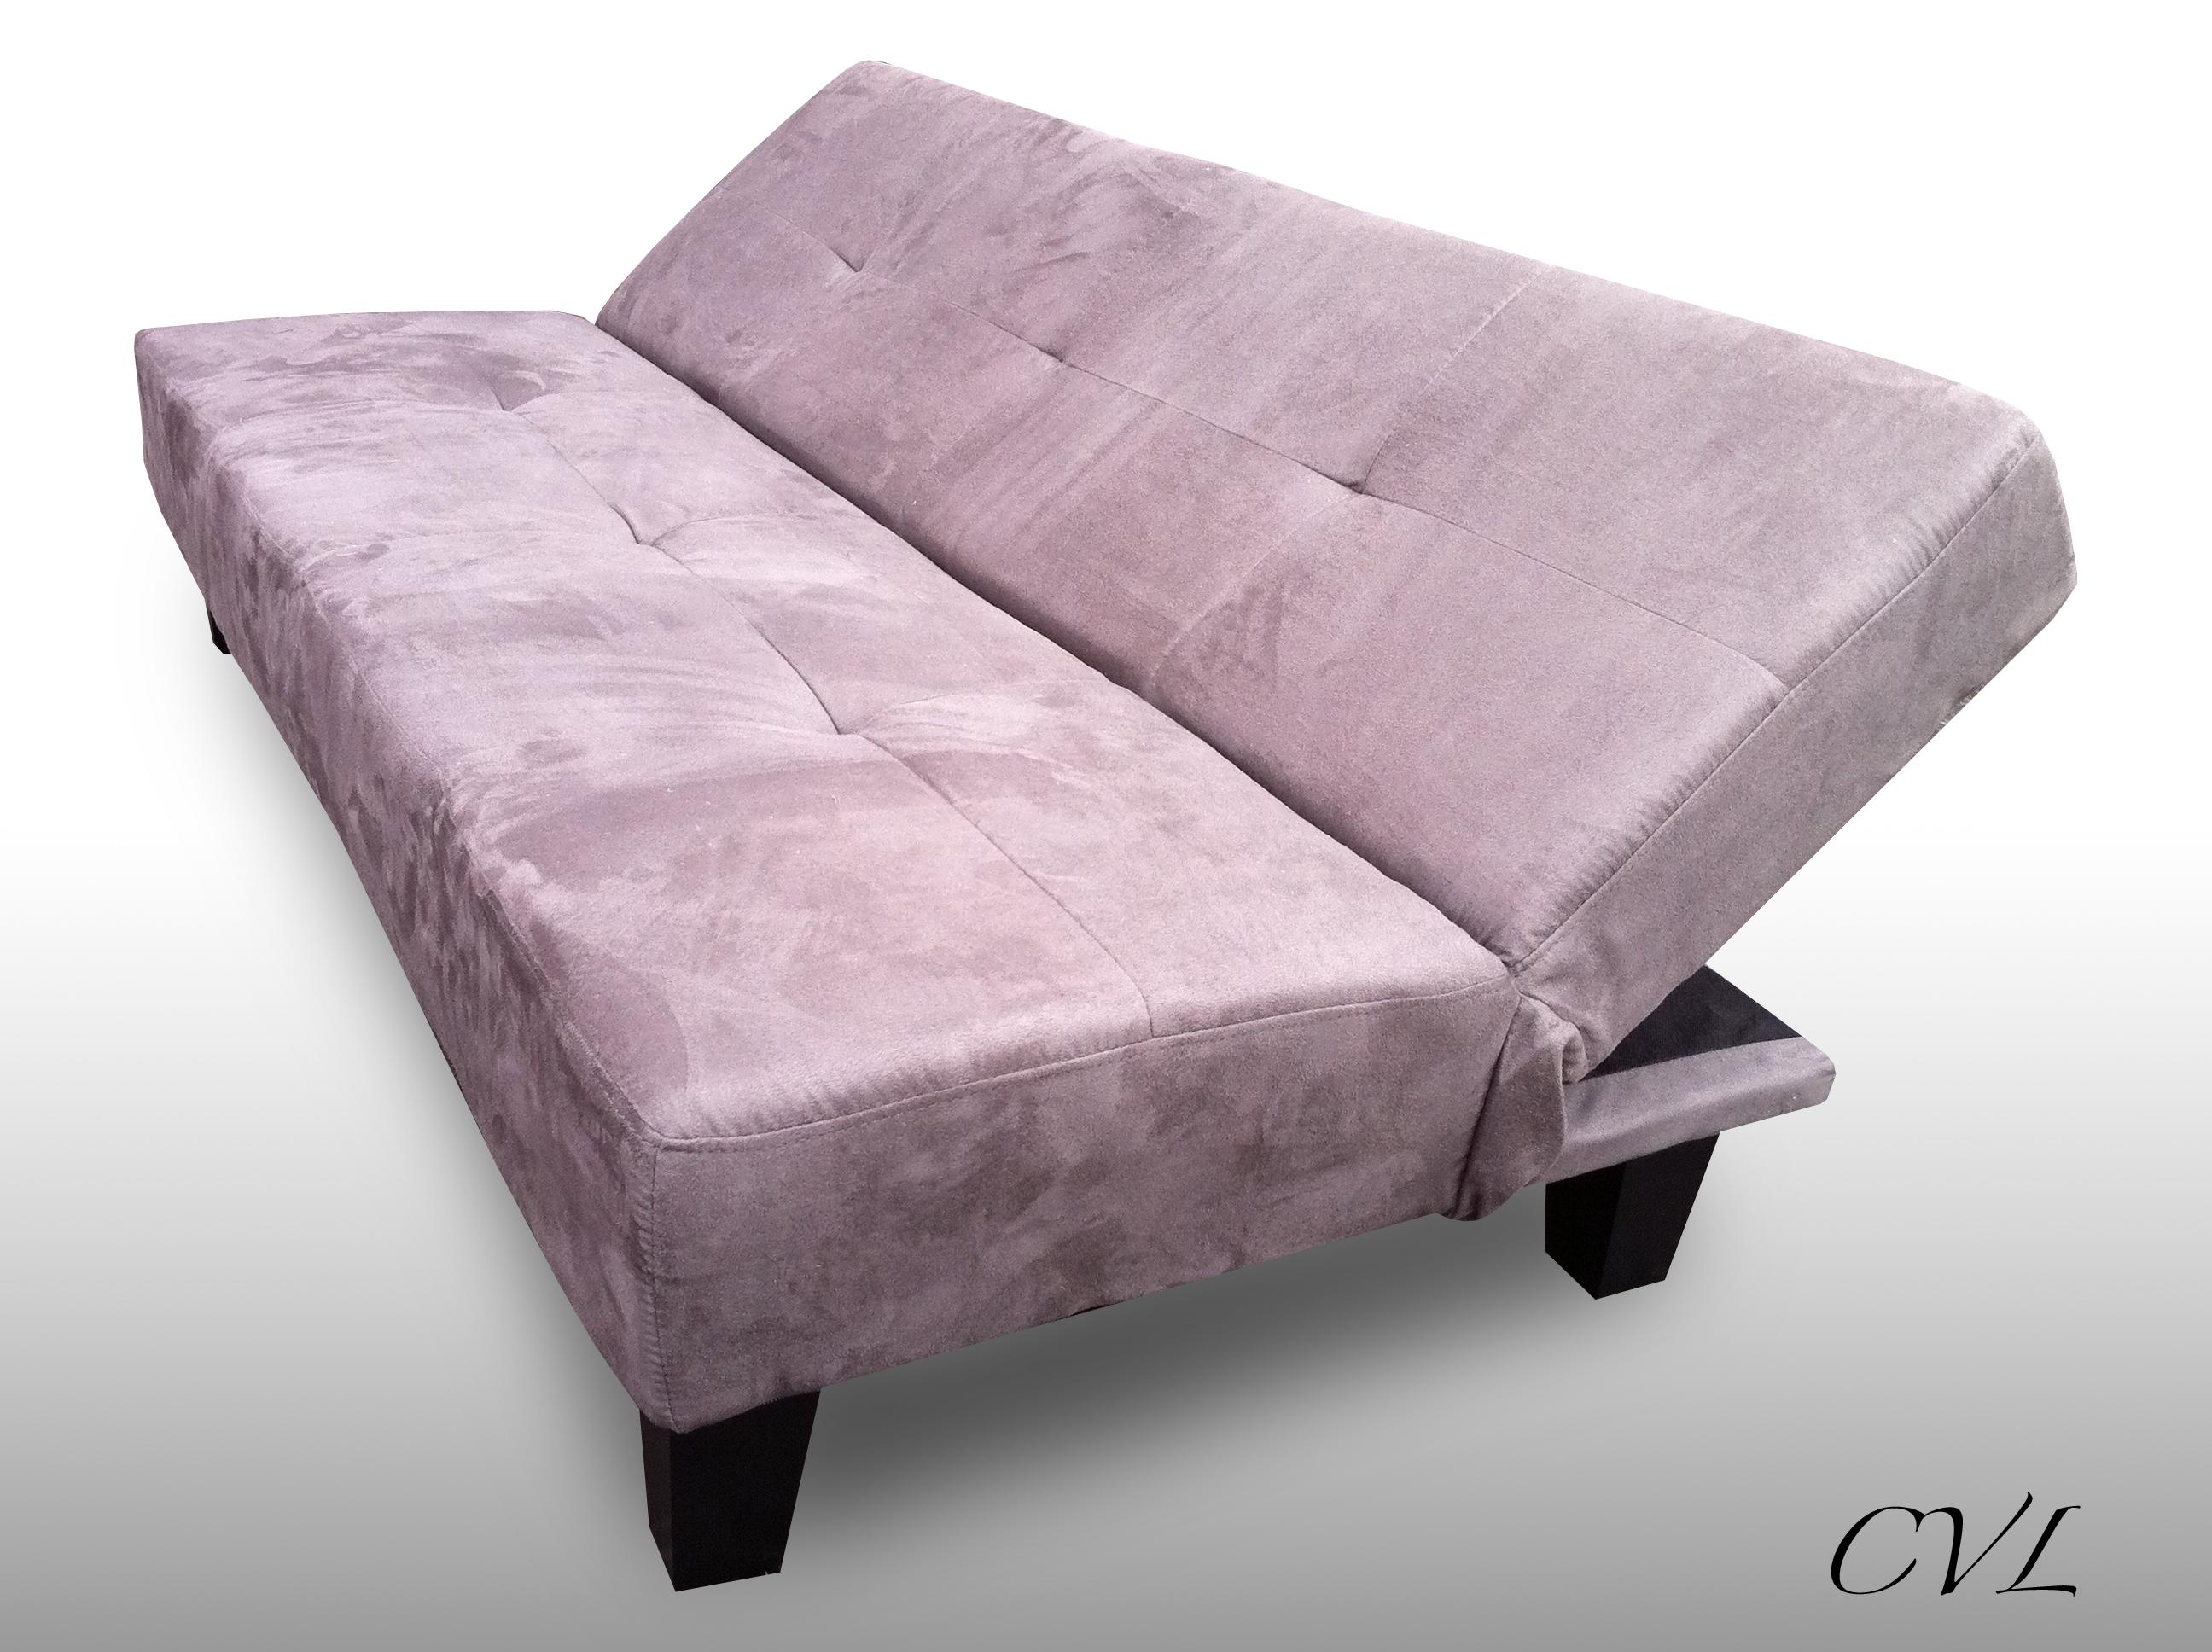 faux suede sofa cleaner black velvet sofas uk luxury effect bed 3 position easy click change